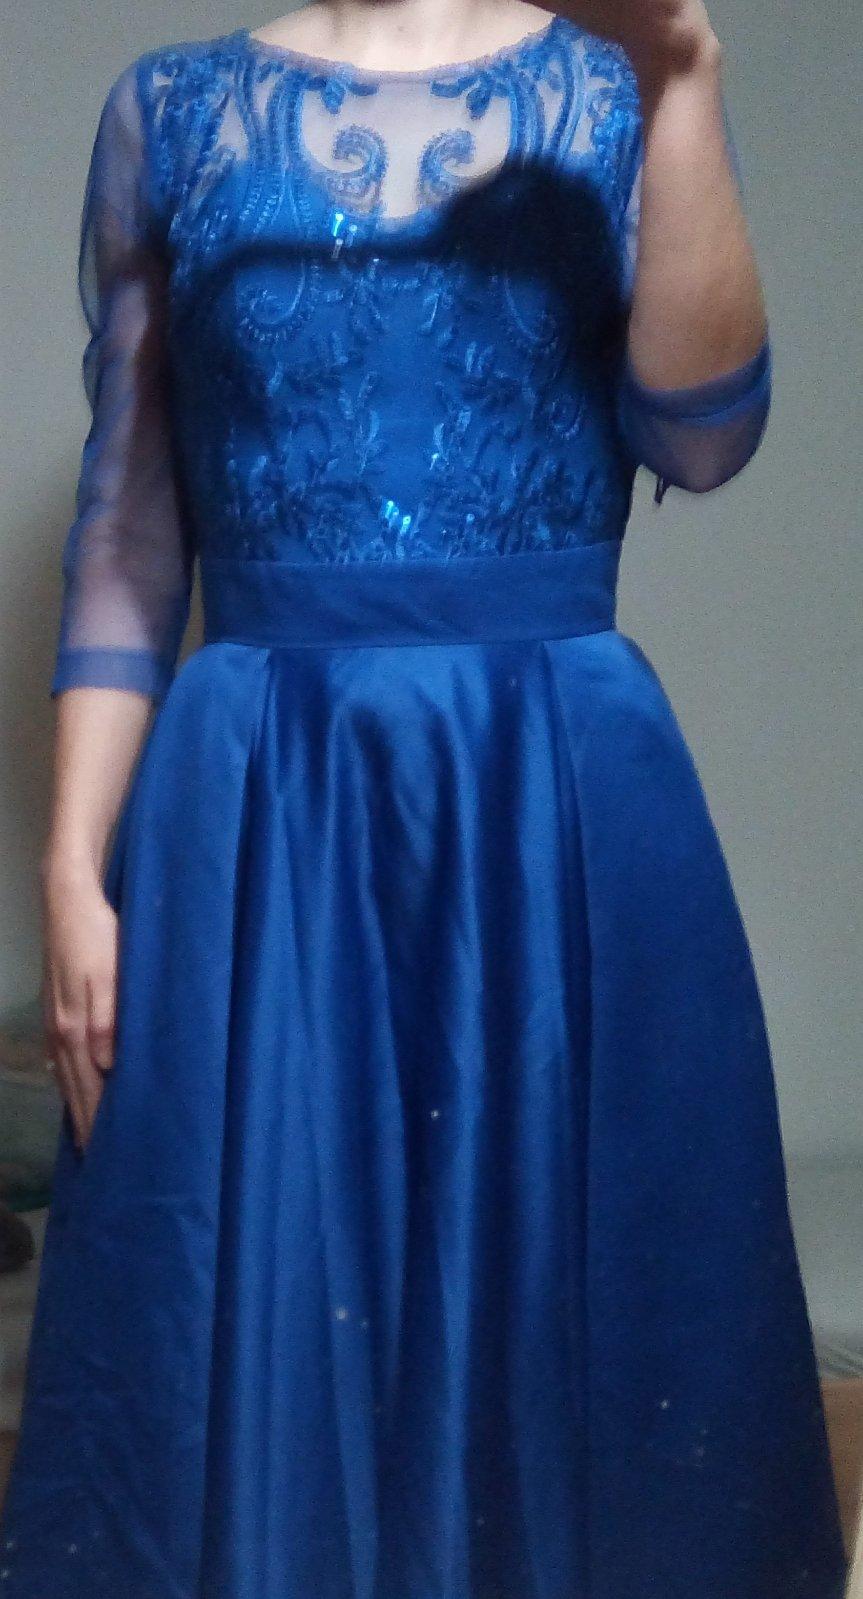 Kráľovsky modré spoločenské dlhé šaty XS - Obrázok č. 1